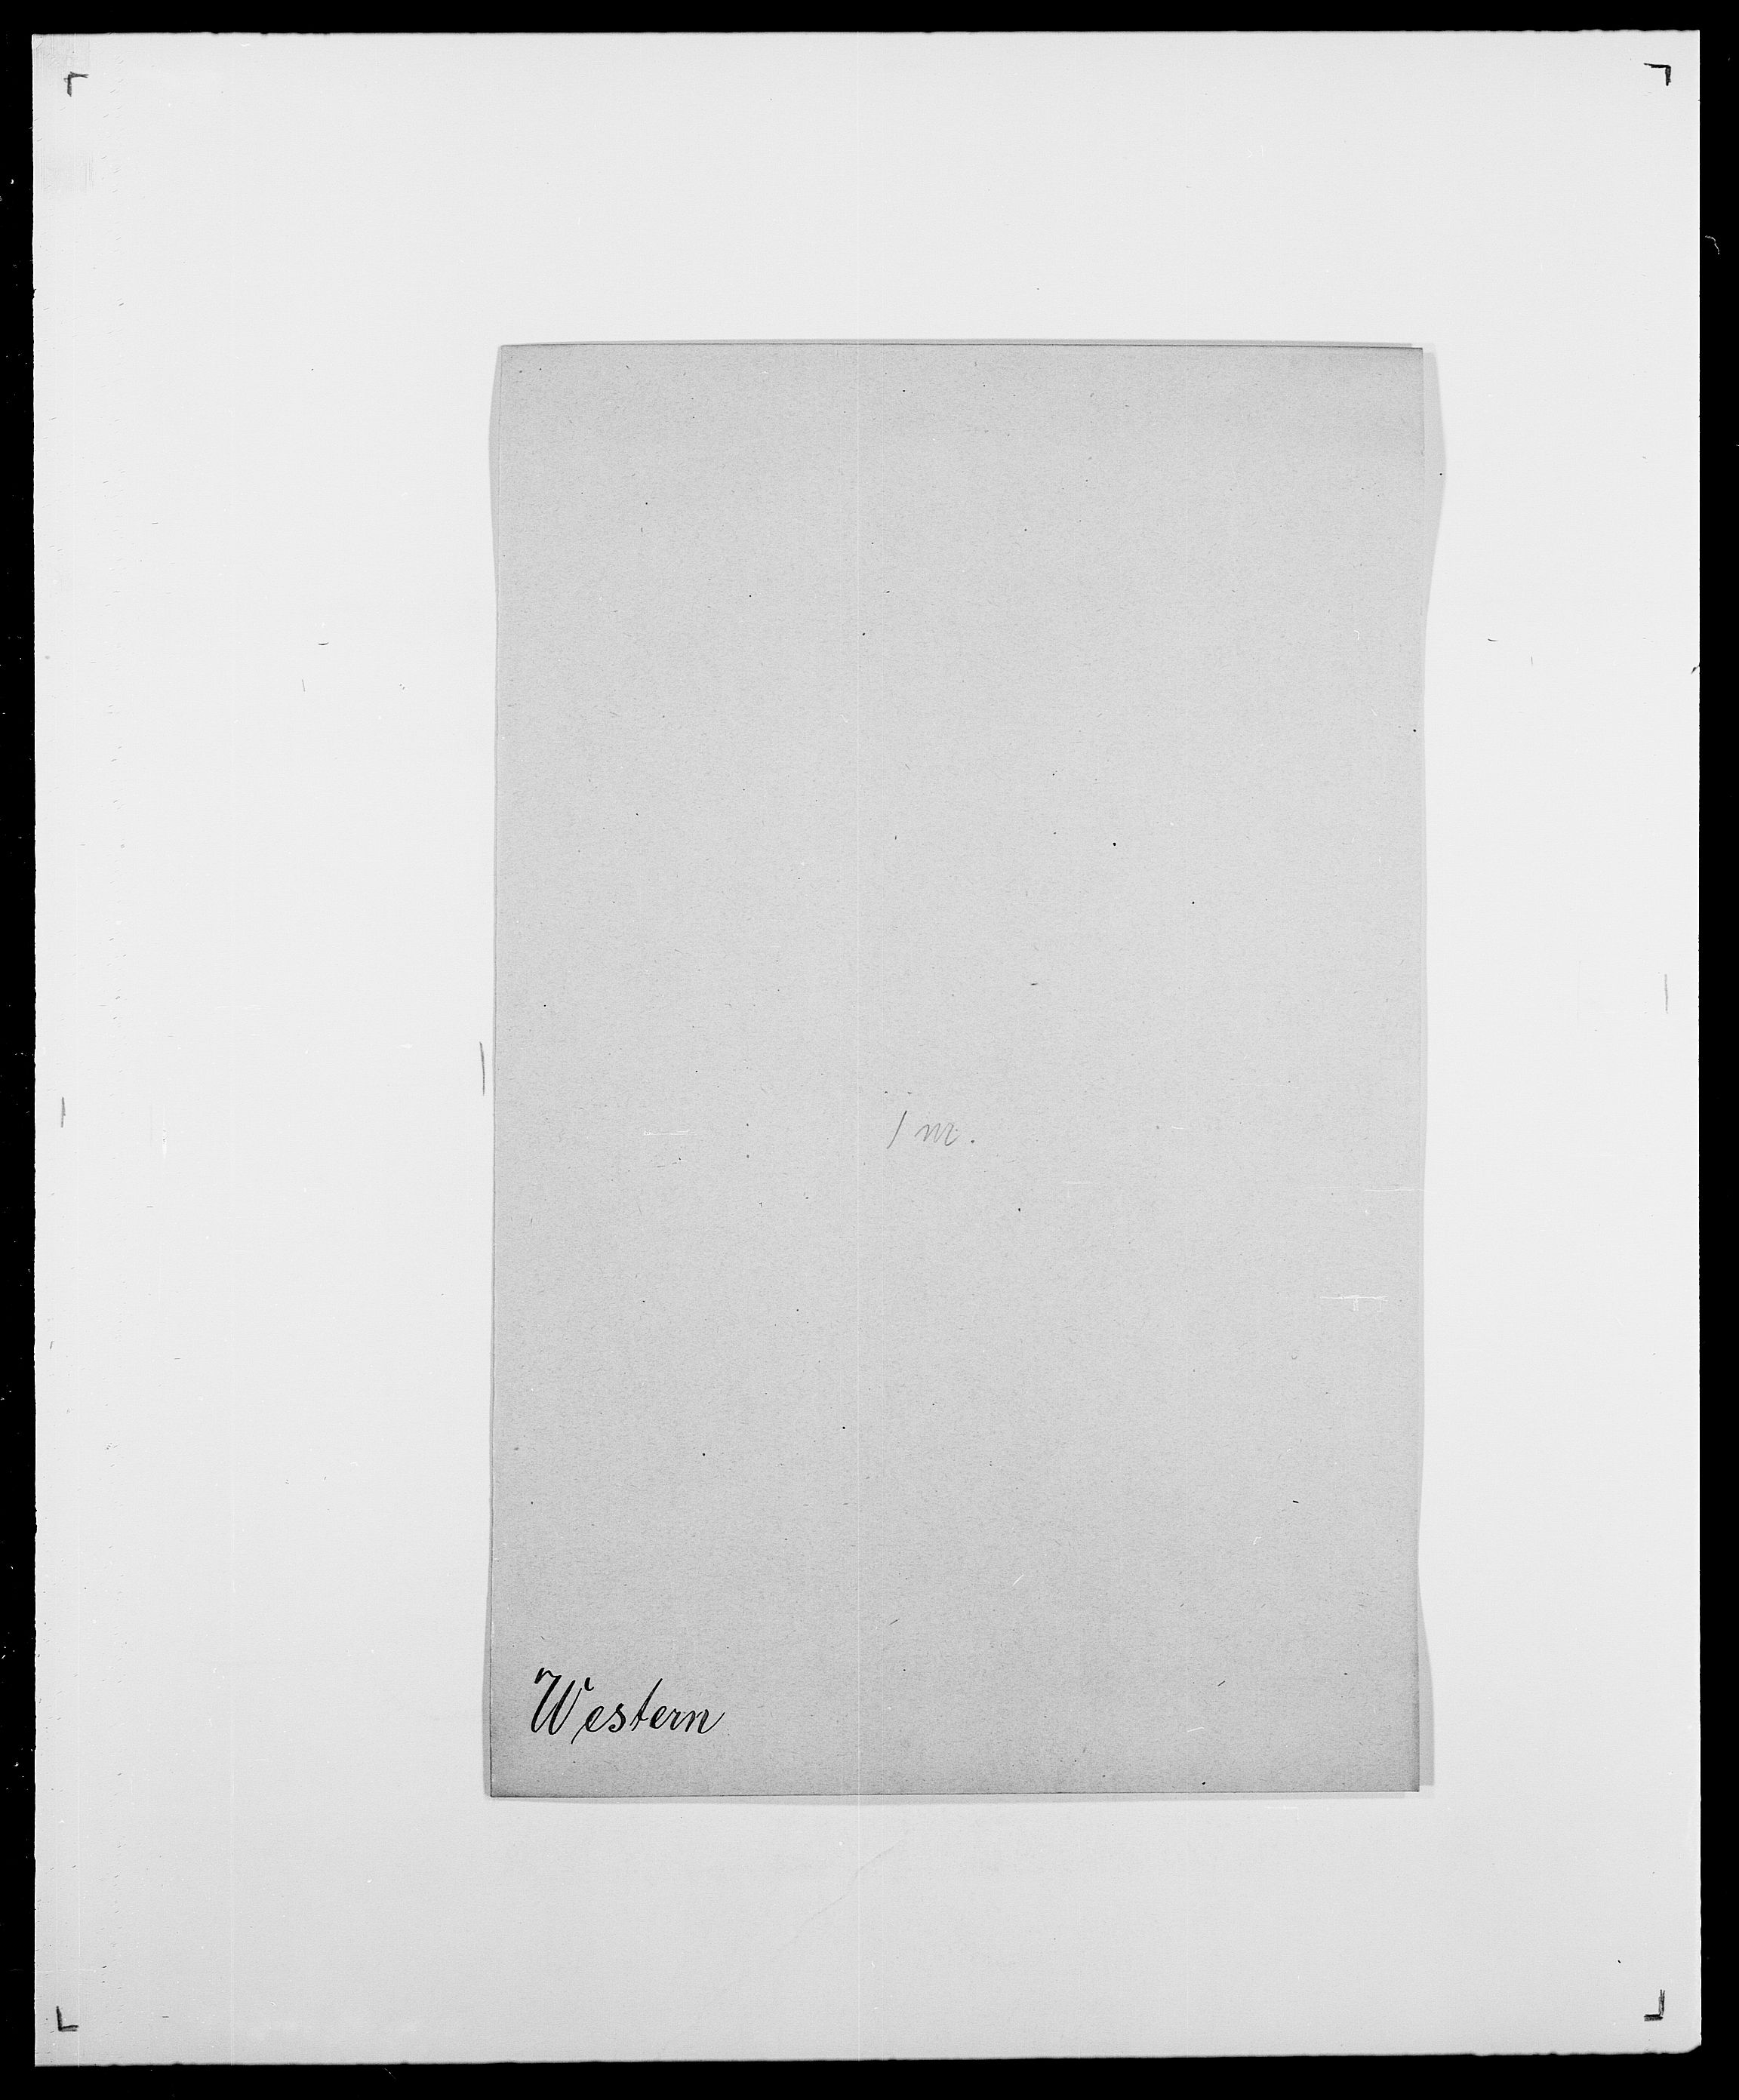 SAO, Delgobe, Charles Antoine - samling, D/Da/L0041: Vemmestad - Viker, s. 289